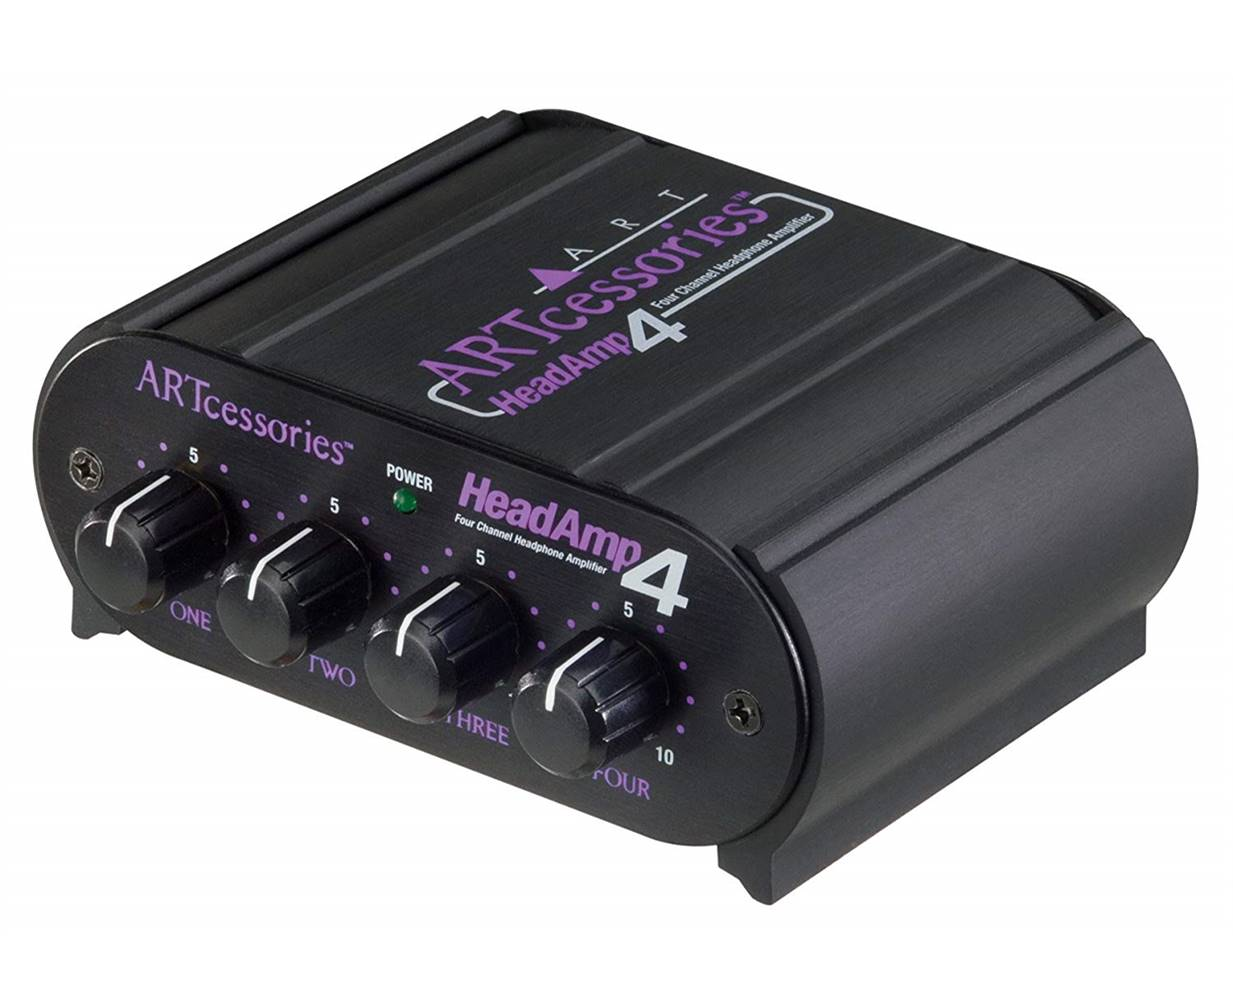 ART HeadAmp4 Stereo Headphone Amp